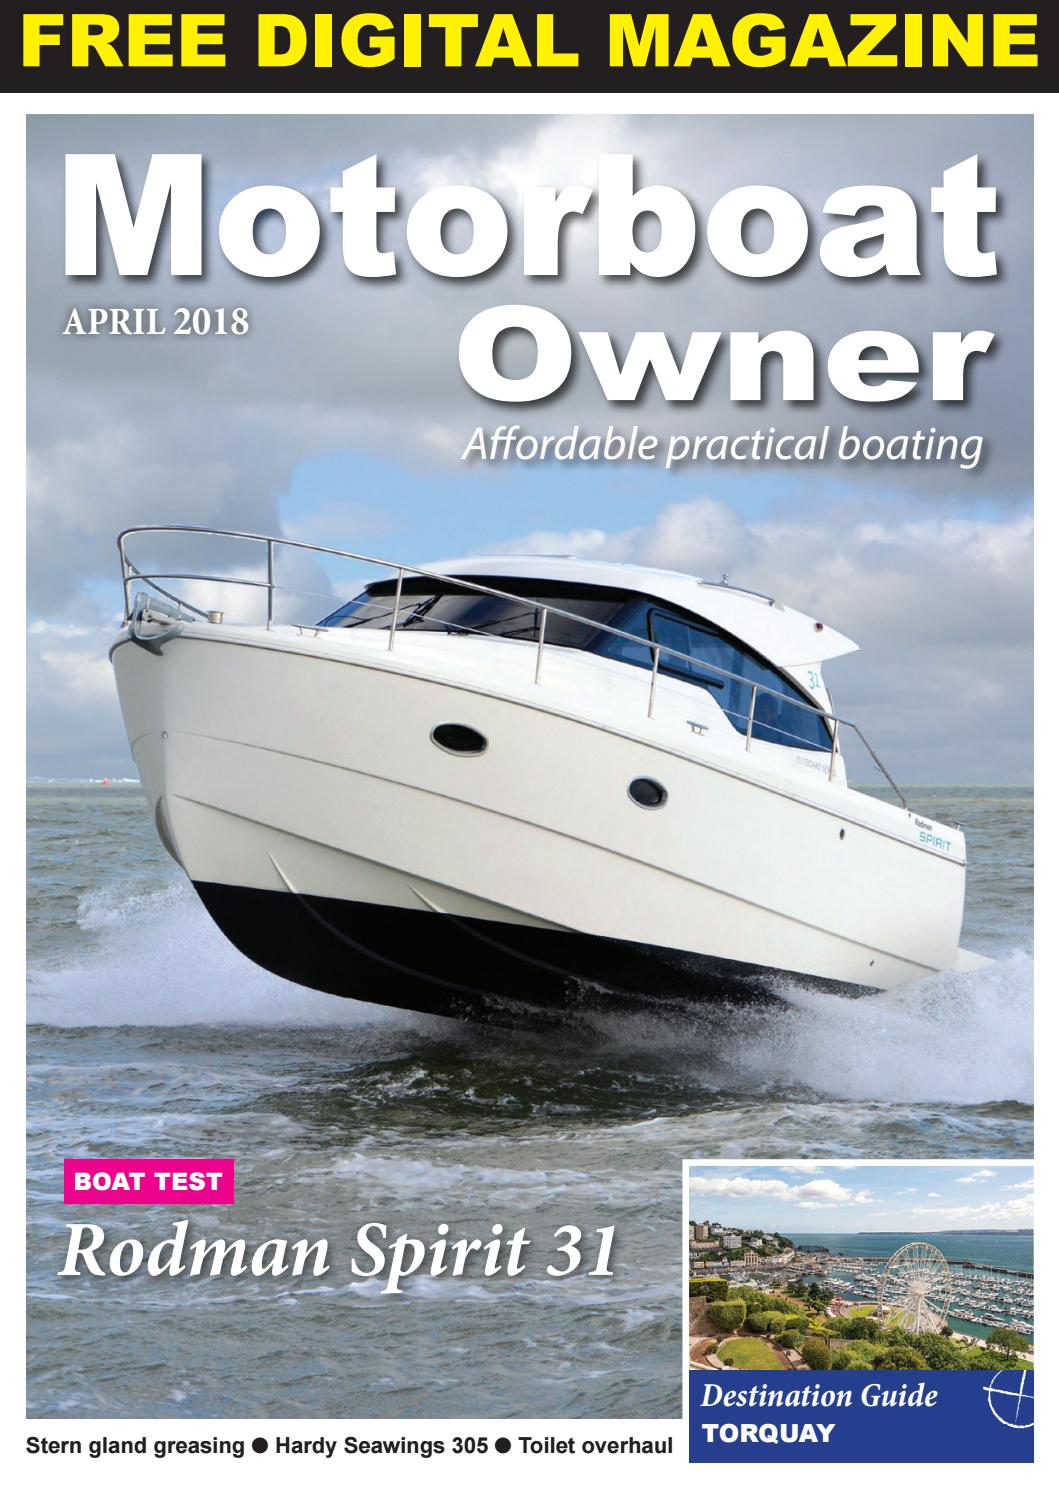 Motorboat Owner April 2018 By Digital Marine Media Ltd Issuu Sea Ray Boat Wiring Diagram Inverter